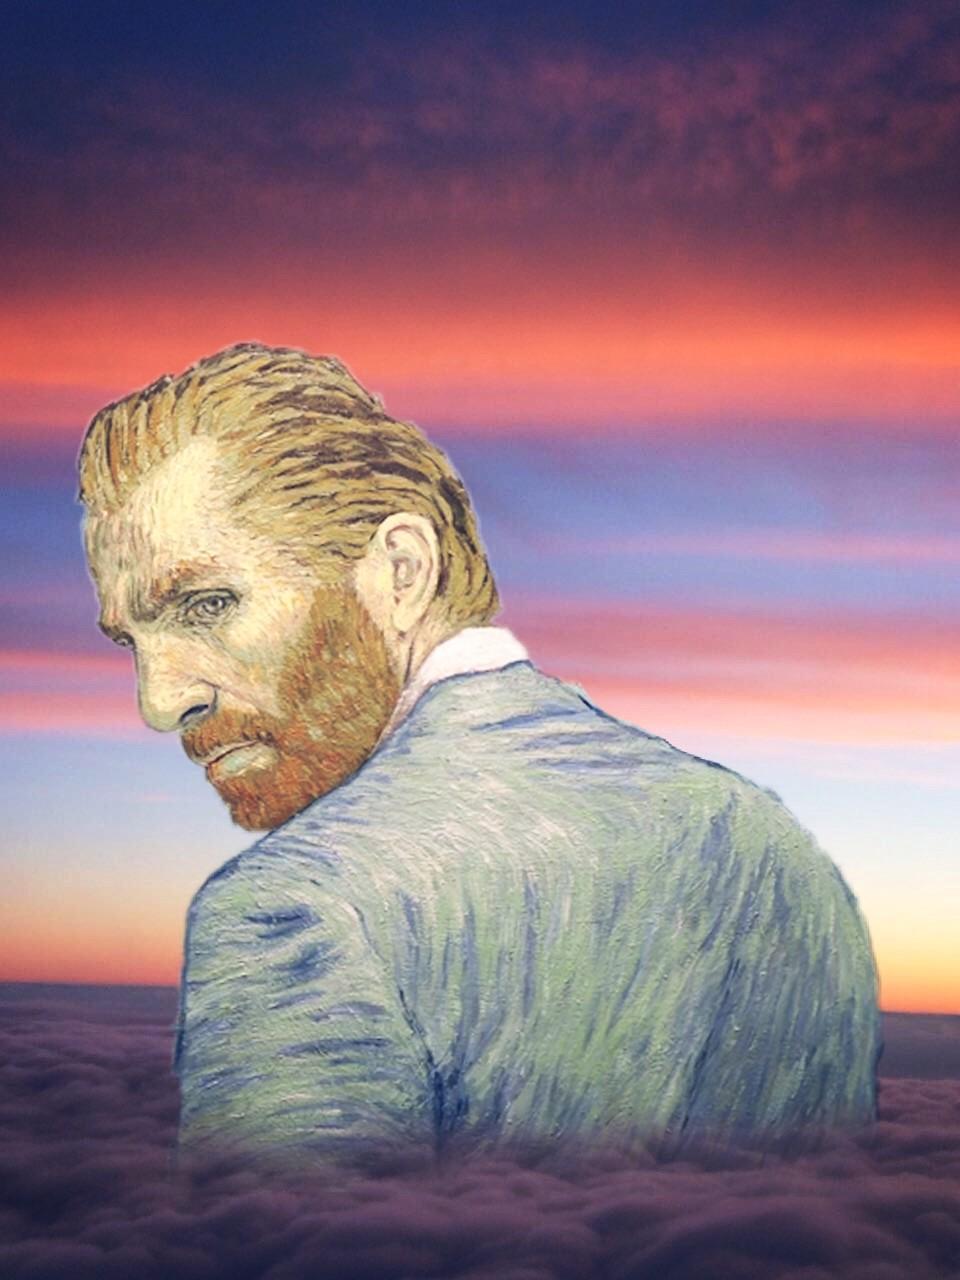 My edit of my favorite artist is Vincent Willem van Gogh (Vunden, March 30, 1853 - Auvers-sur-Oise, July 29, 1890) was a Dutch painter. #smashup #smashups